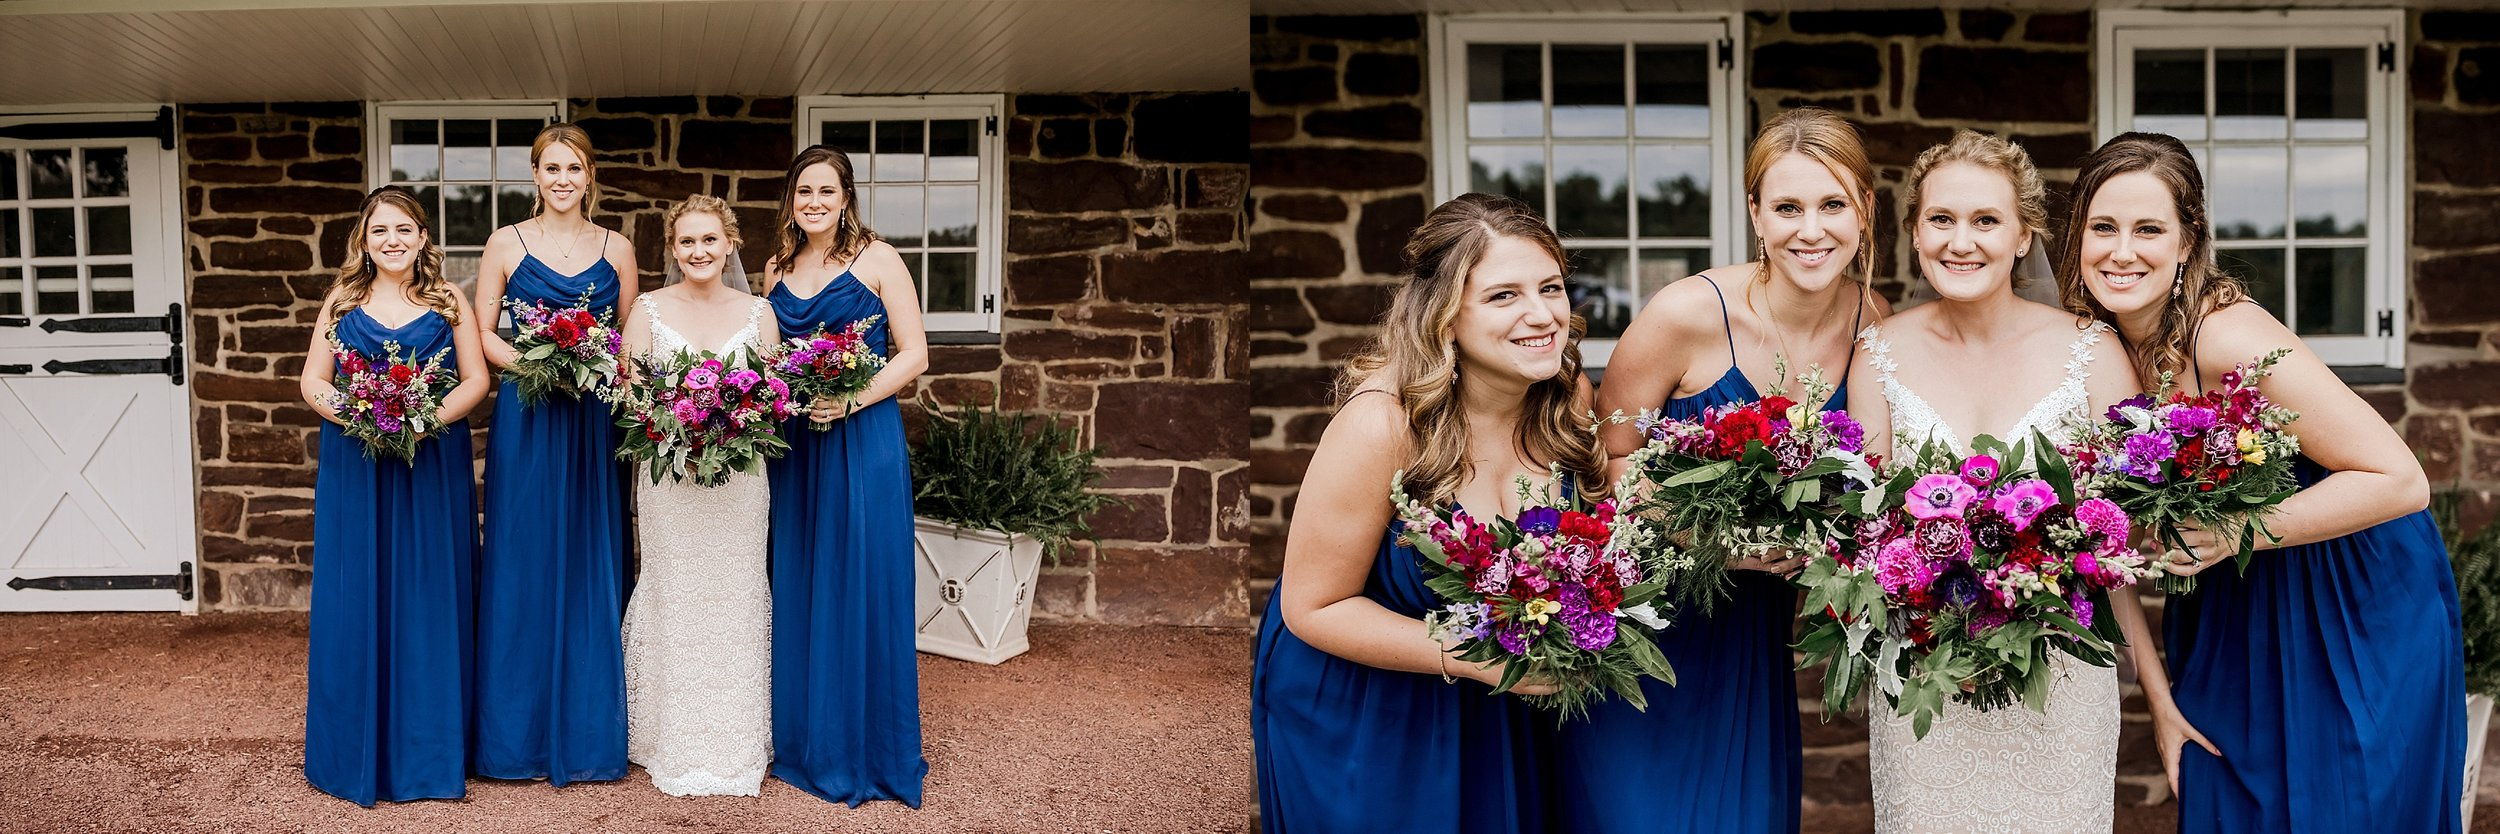 Durham-Hill-Farm-Wedding-Photographer_0059.jpg